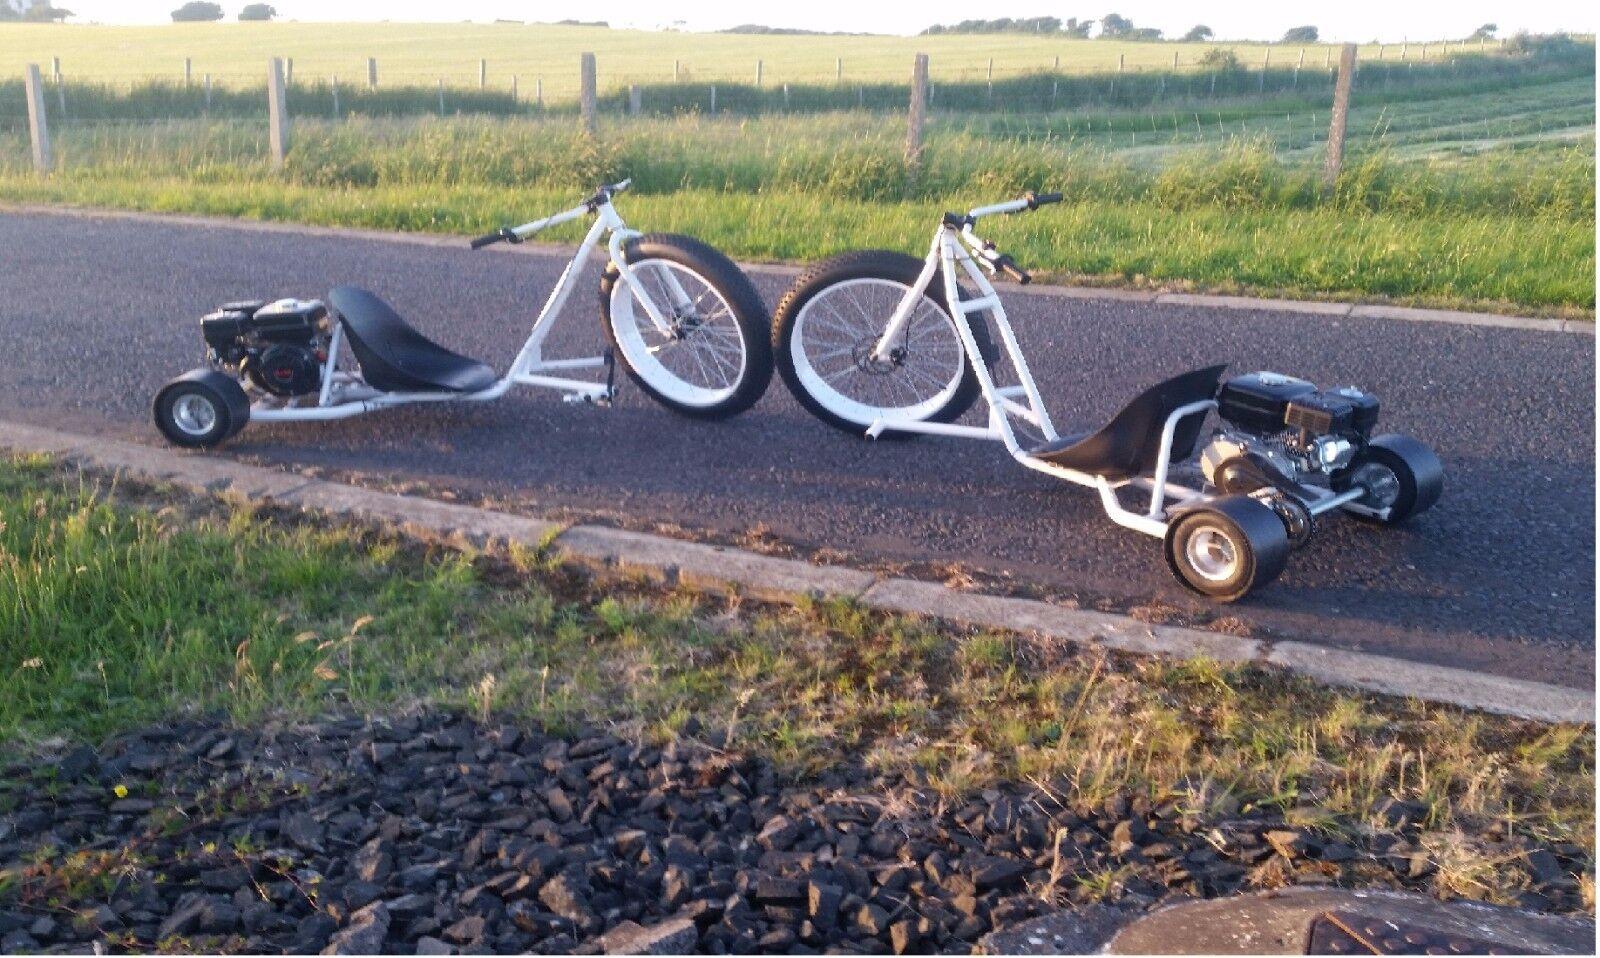 6f707bdada4 Details about Drift Trike Big wheel Bikes three wheeler drifter 20